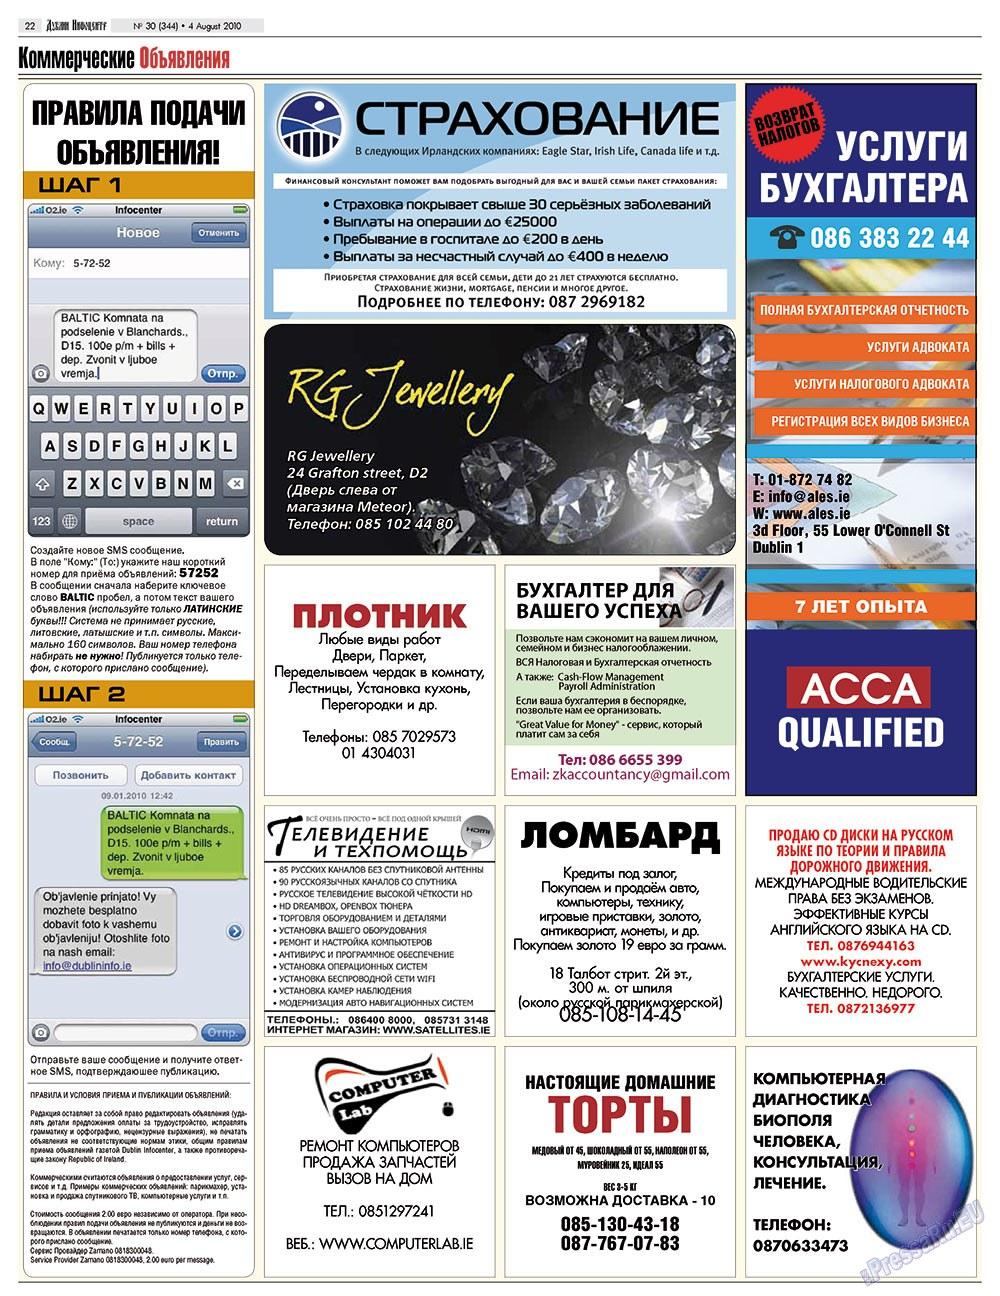 Дублин инфоцентр (газета). 2010 год, номер 30, стр. 22